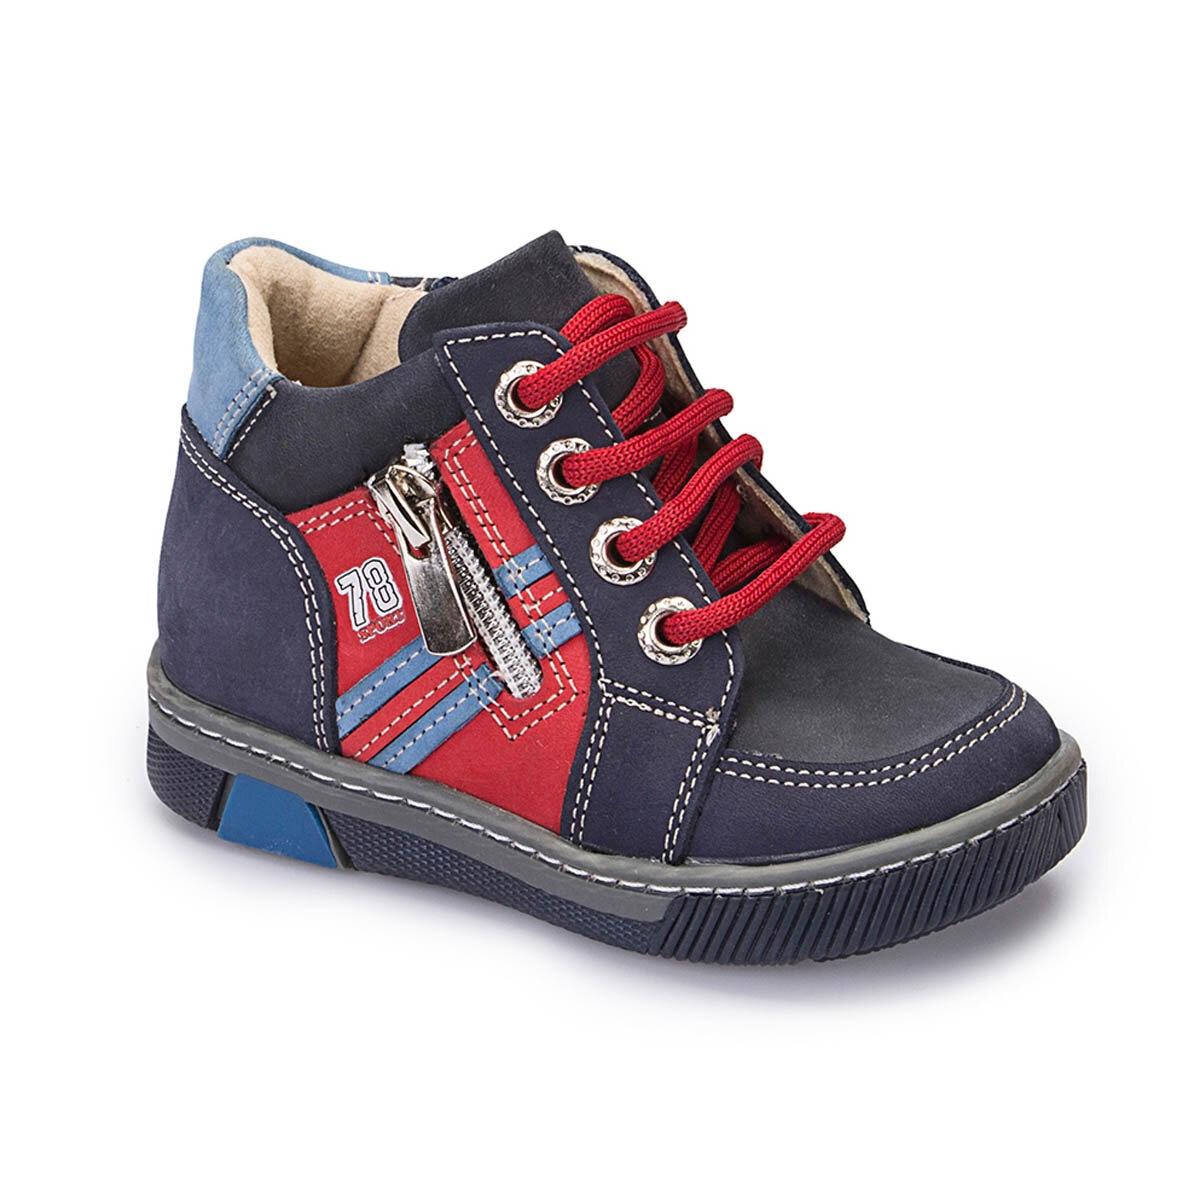 FLO-حذاء بولاريس أزرق داكن للرجال 62.508424.B